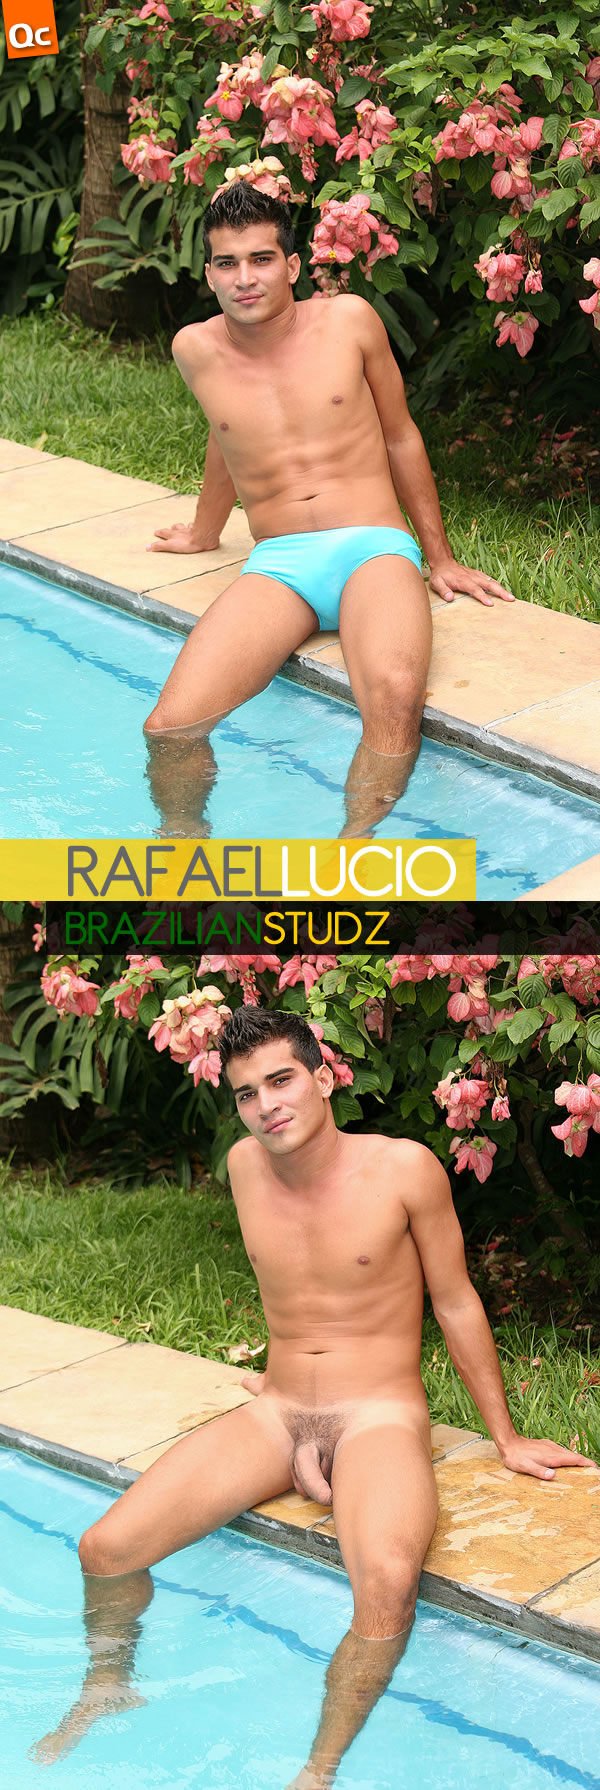 Brazilian Studz: Rafael Lucio